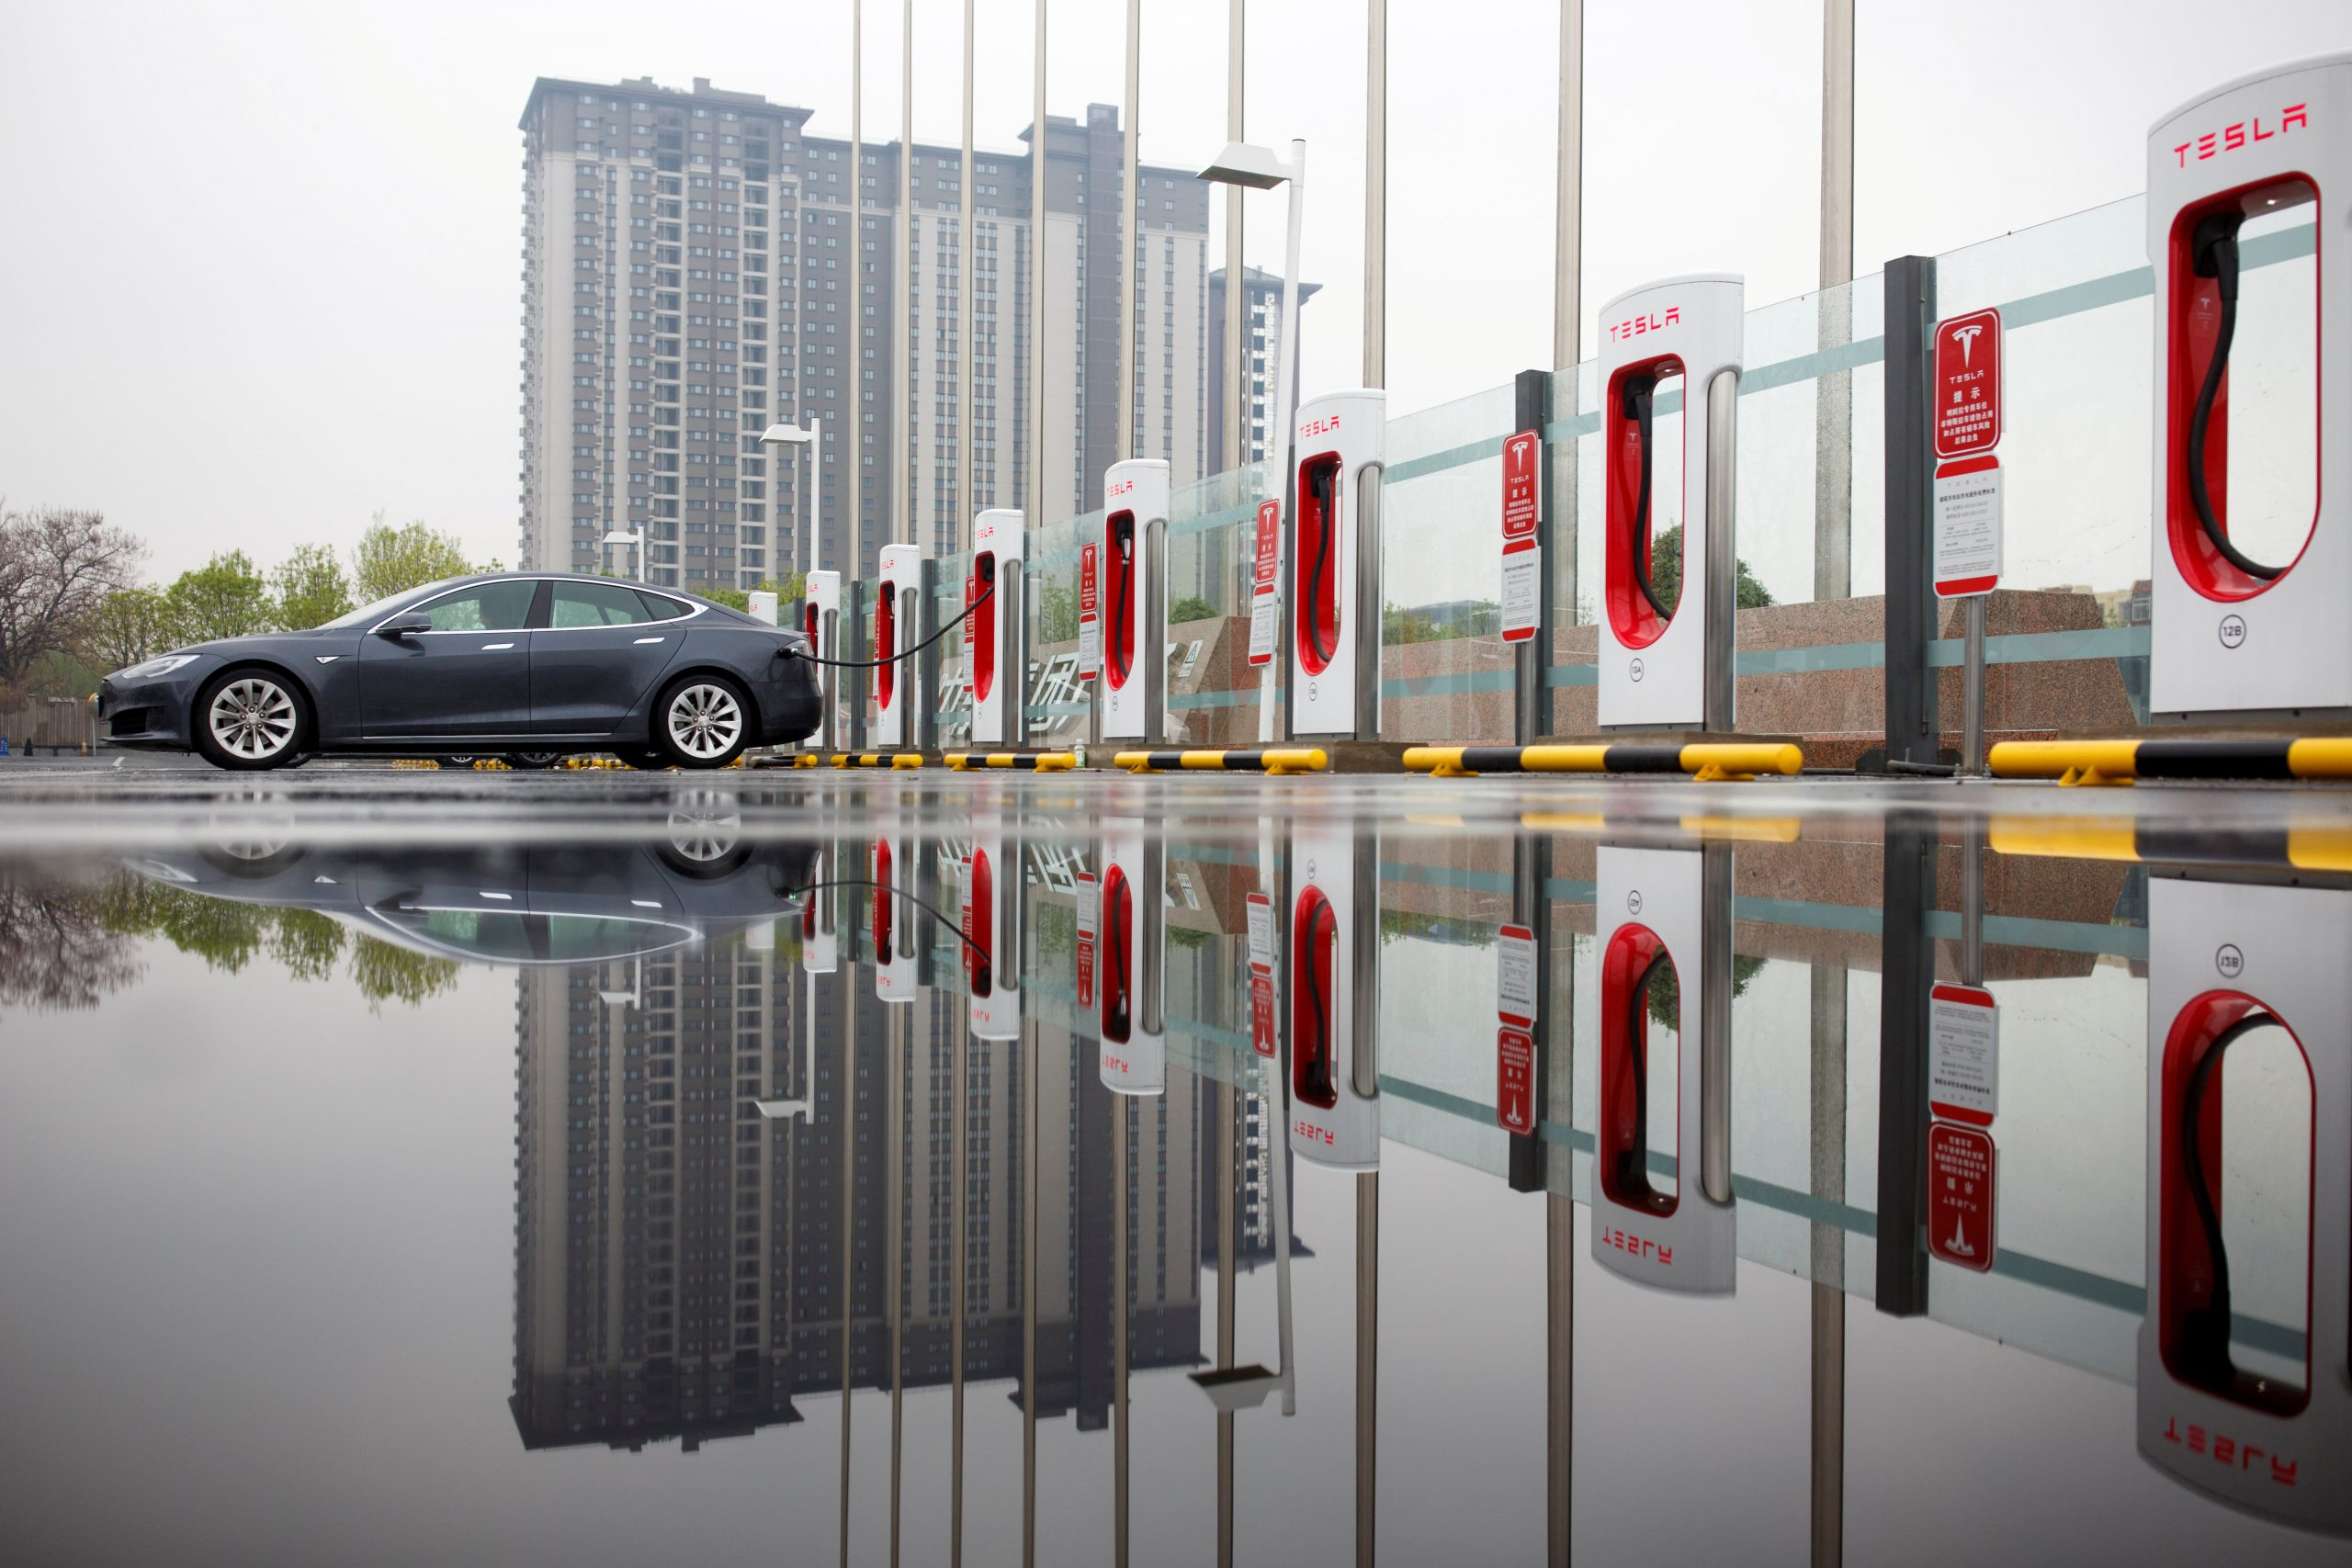 Tesla's Model Y slumps in China sales rankings, data shows